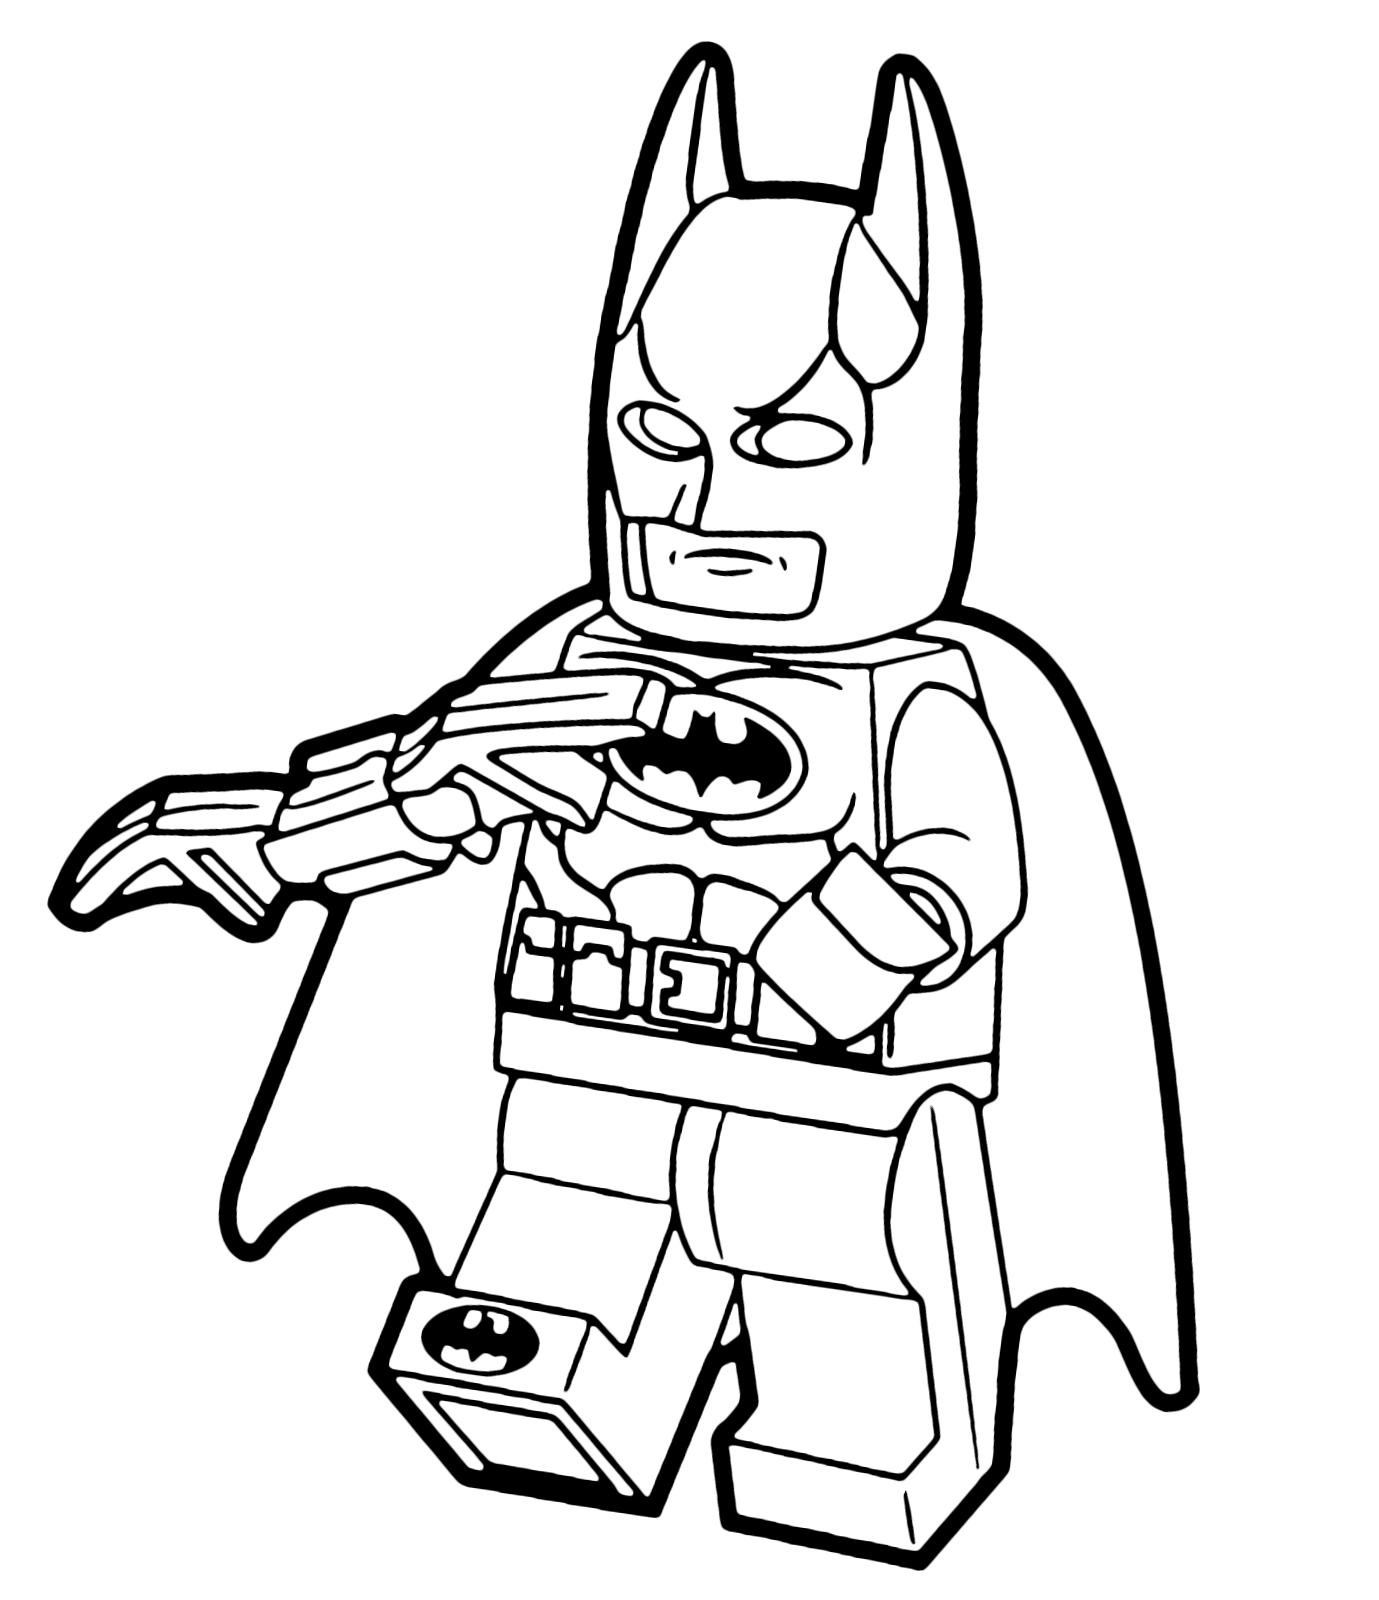 Disegni Da Colorare Batman Lego Fredrotgans